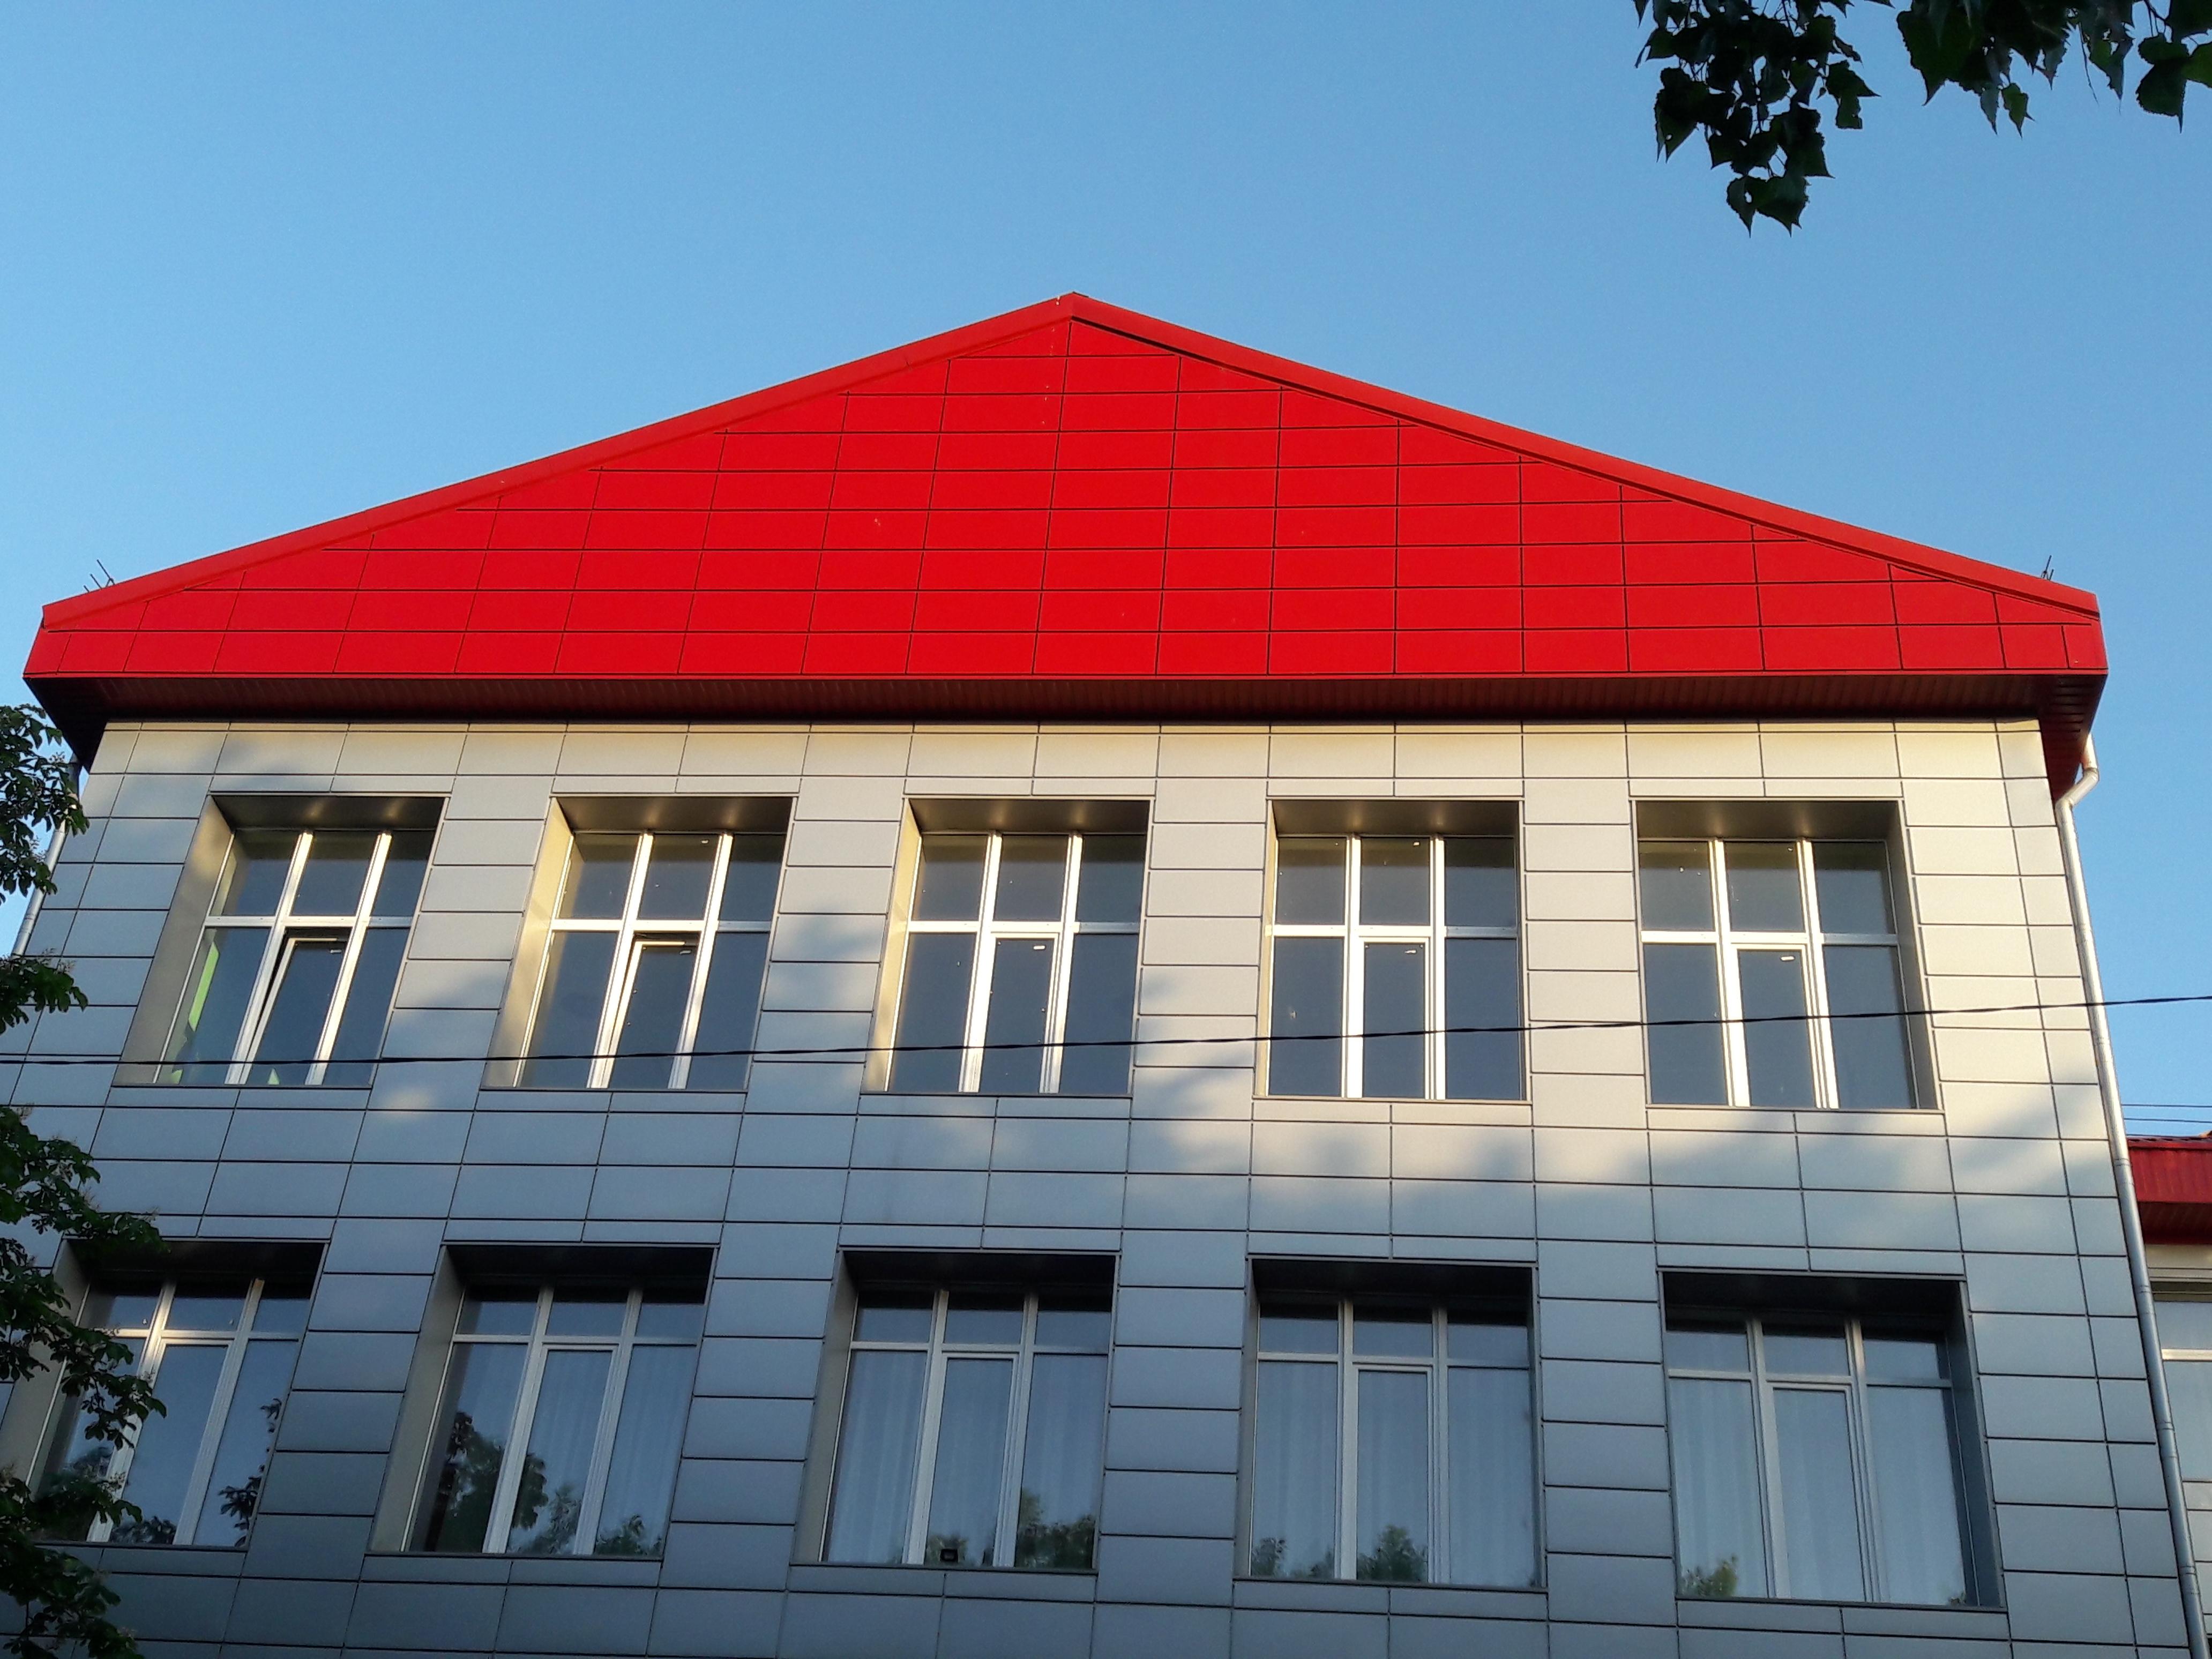 Кассеты Фасадные Классик (RAL 3011 глянец) 0,7 мм 475*475 мм